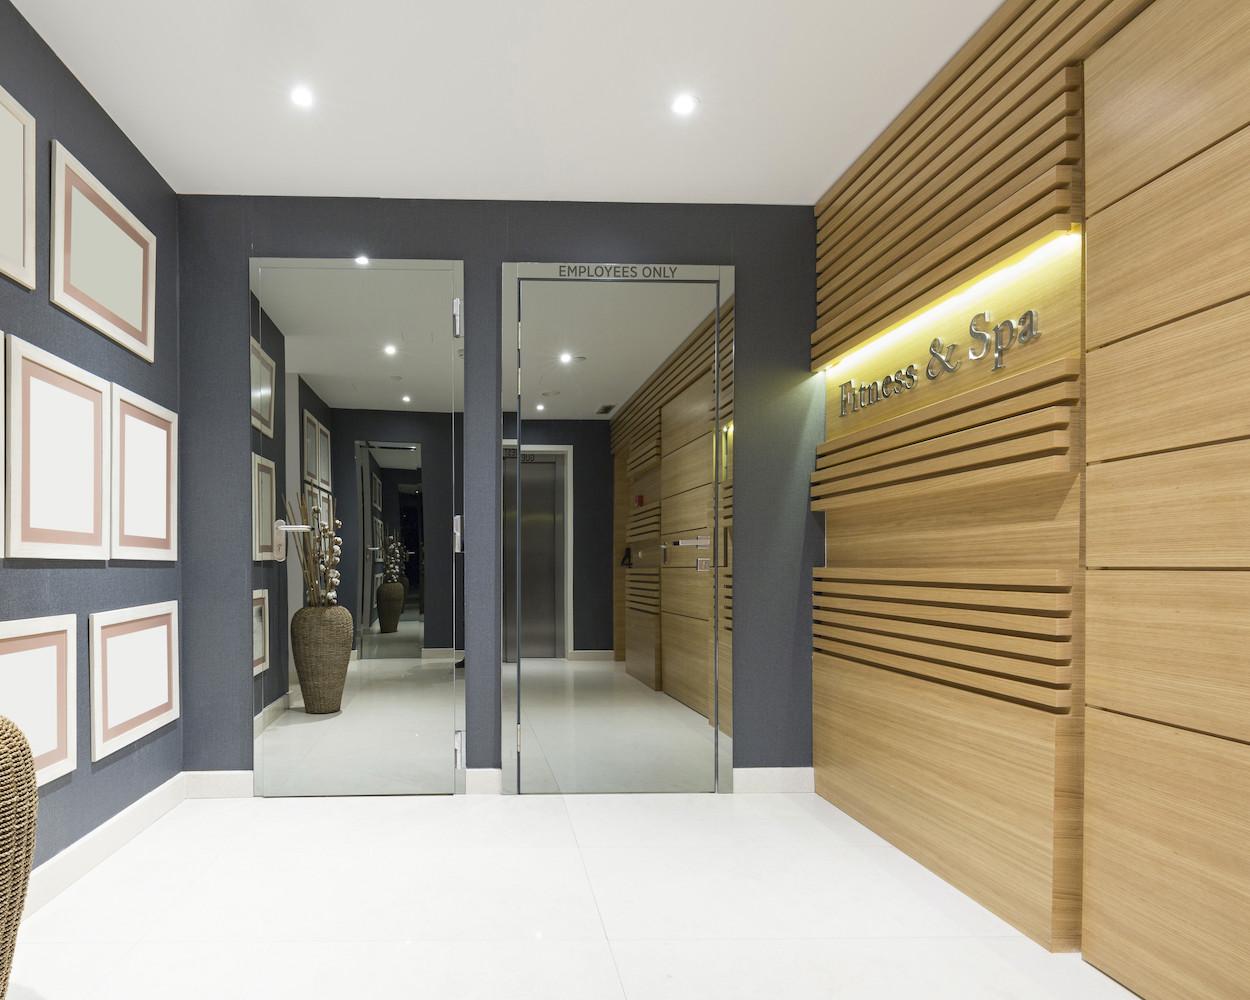 Elements Of Medical Spa Interior Design La Healthcare Design Inc